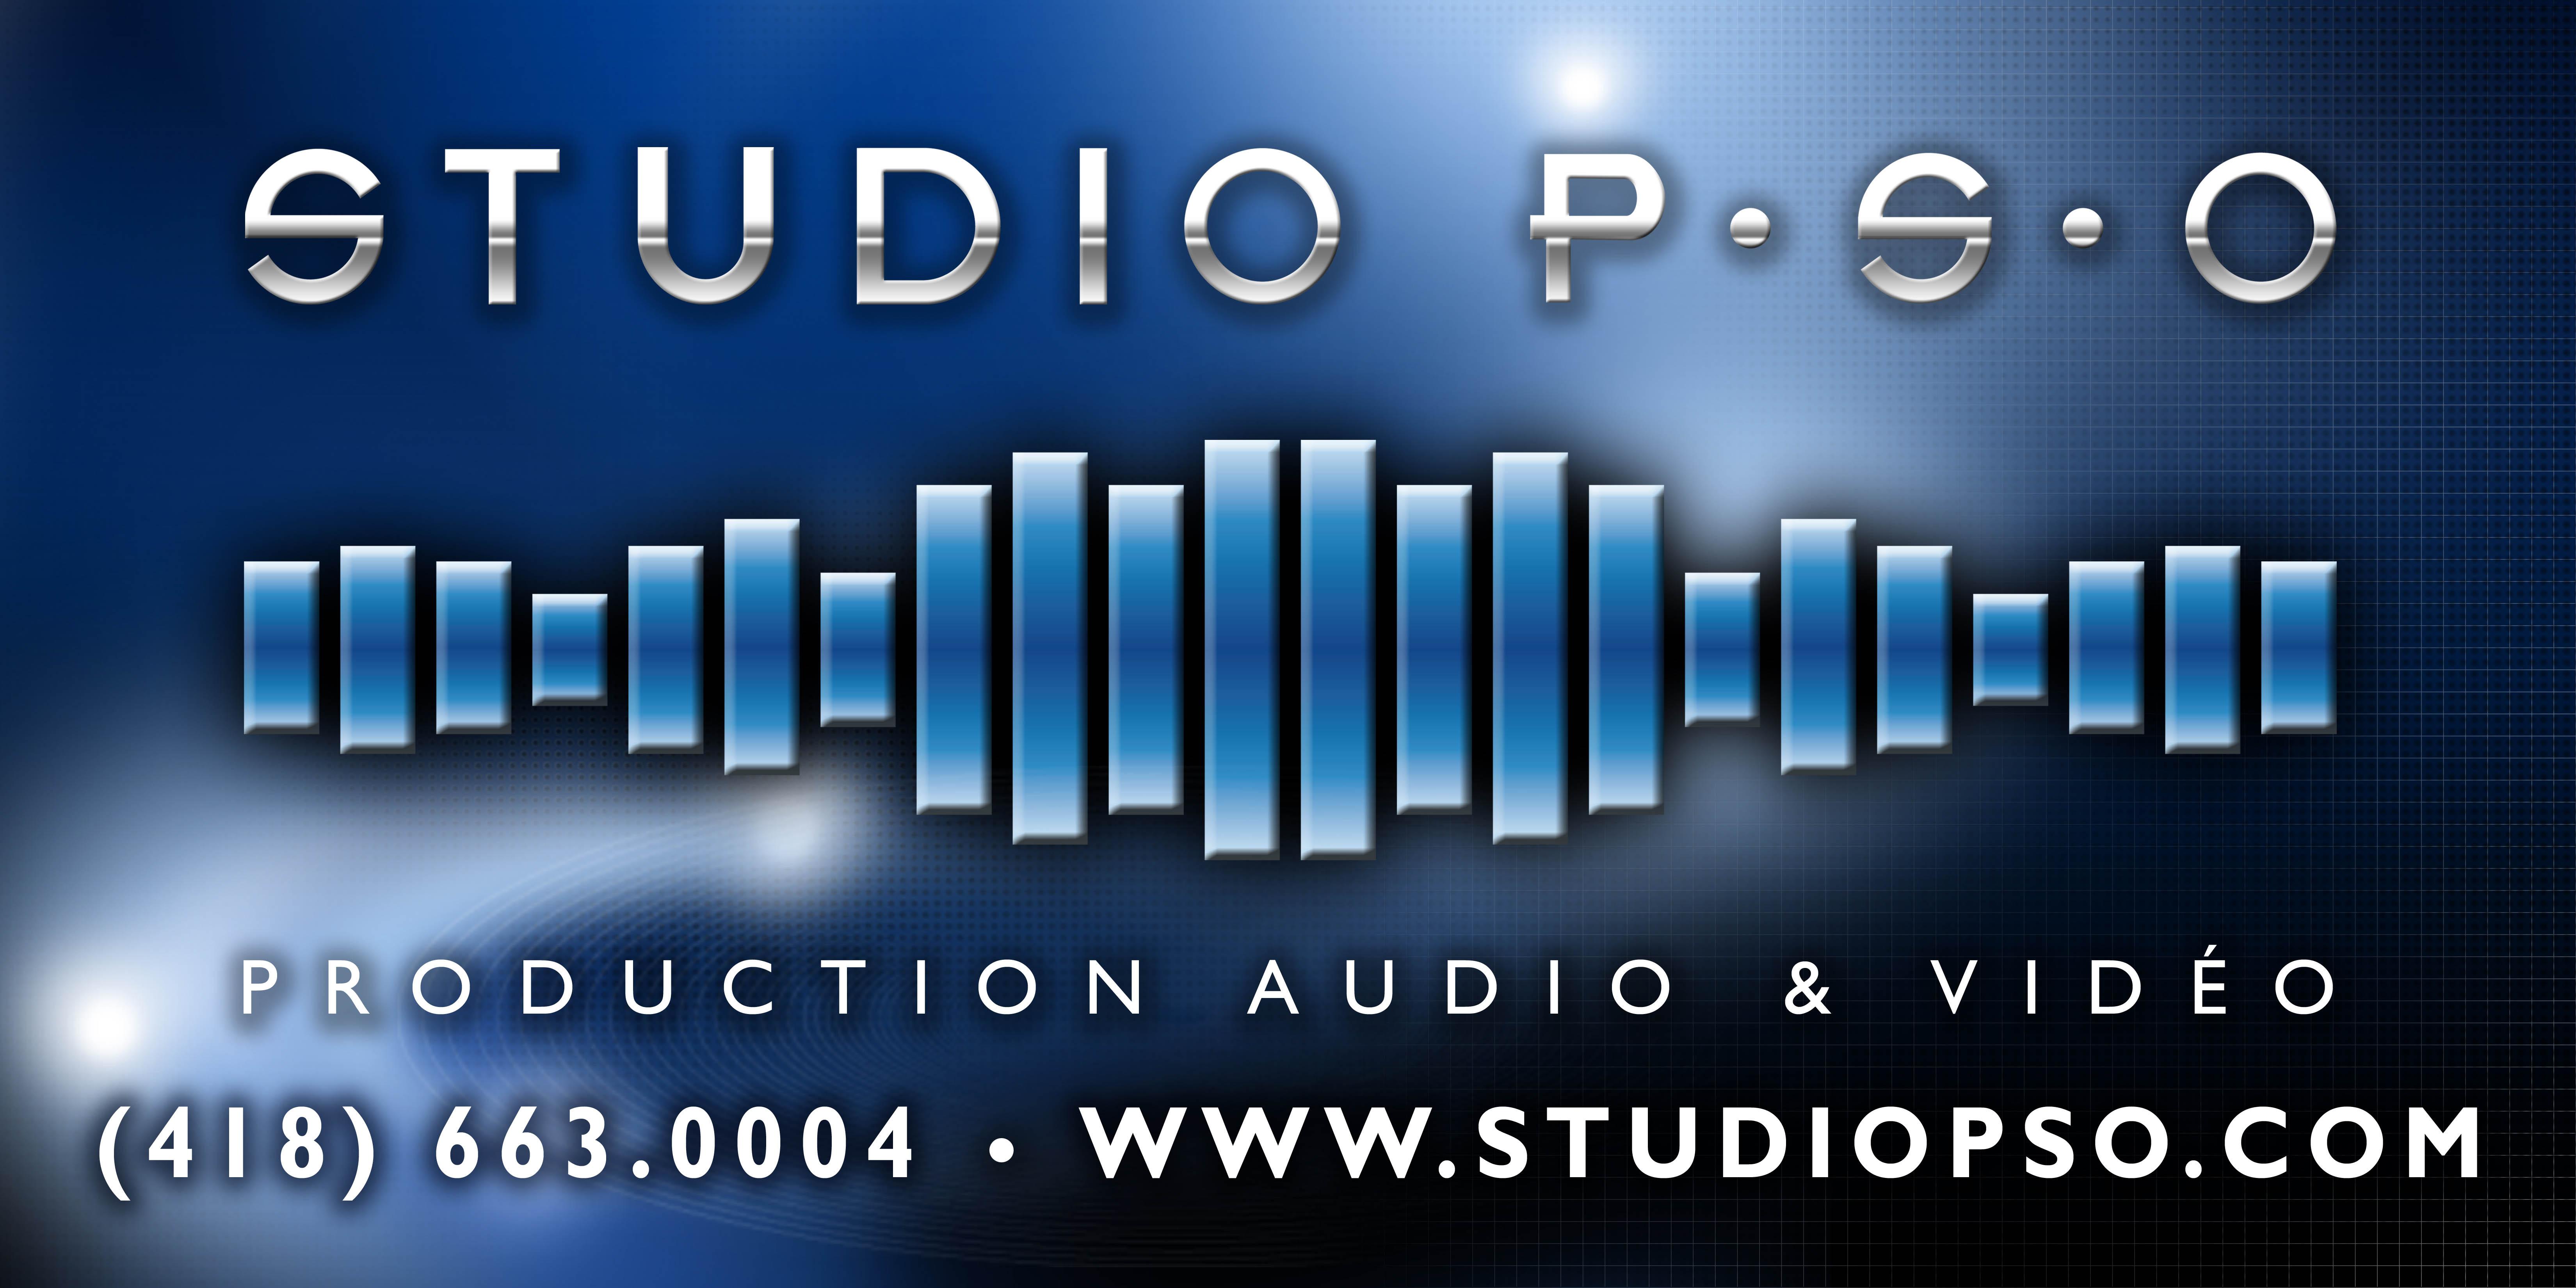 CA-Studio_PSO